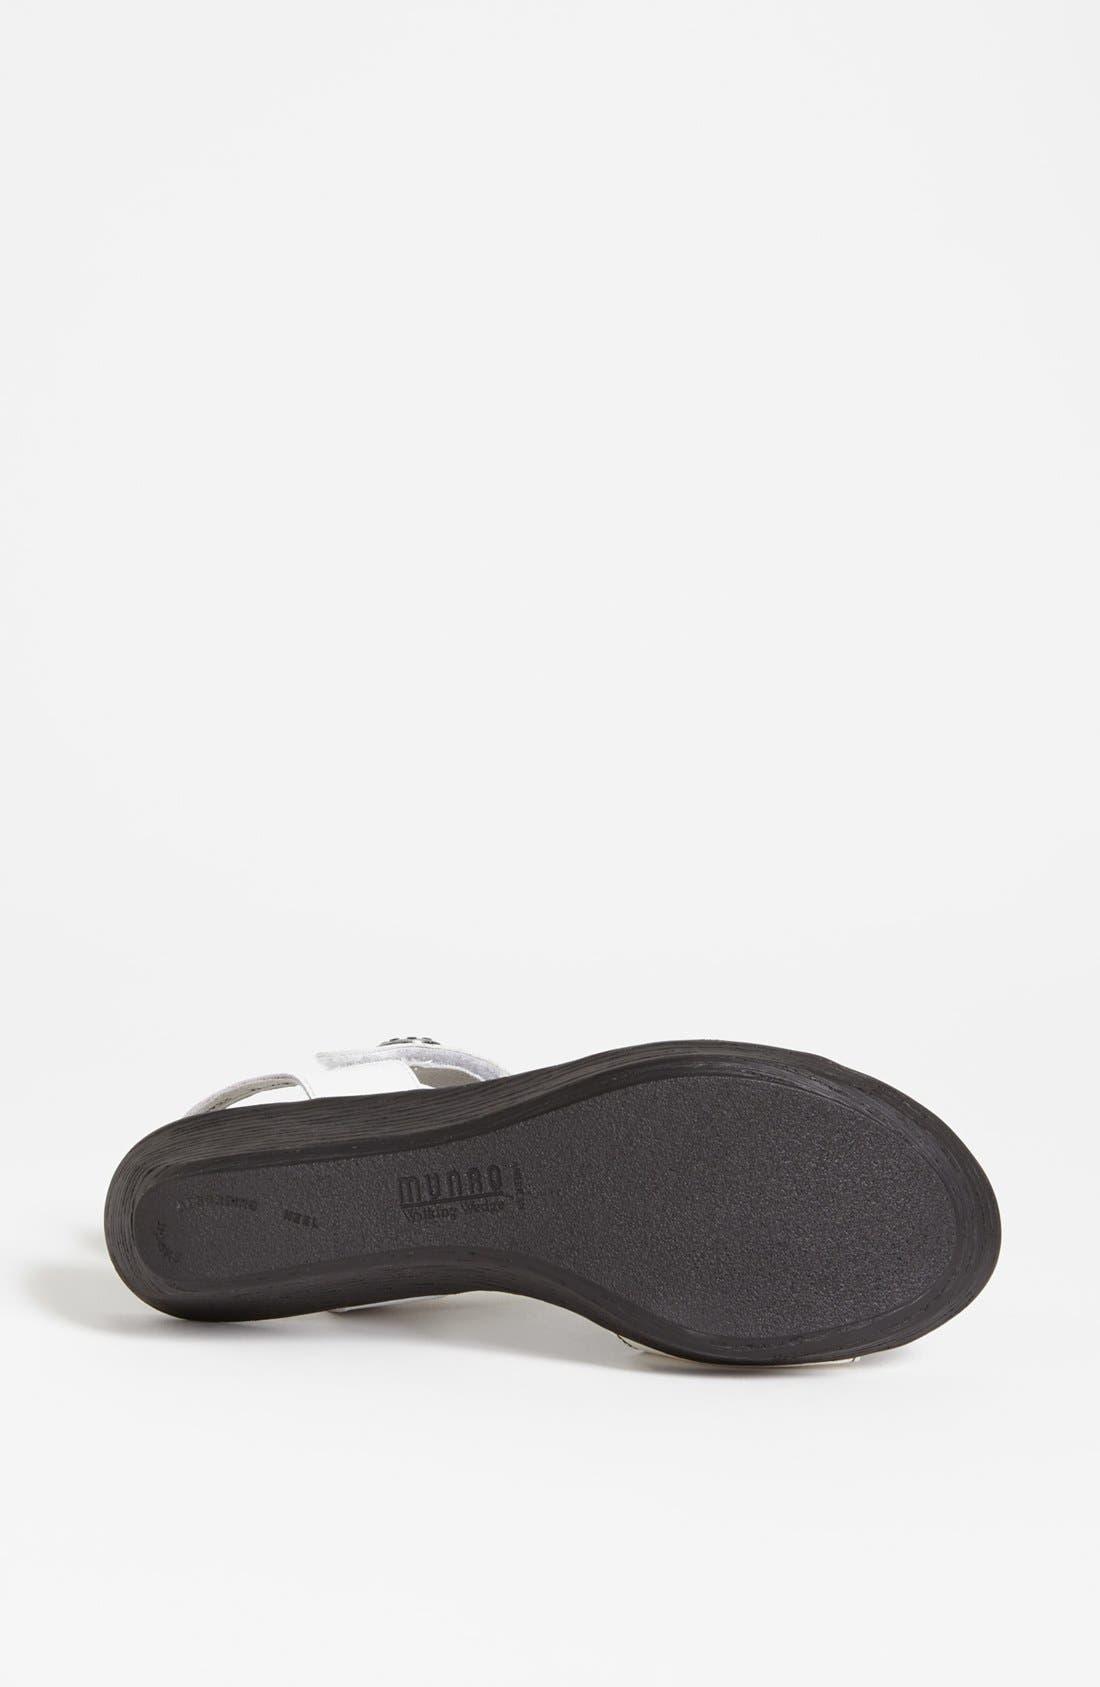 Alternate Image 4  - Munro 'Tyra' Sandal